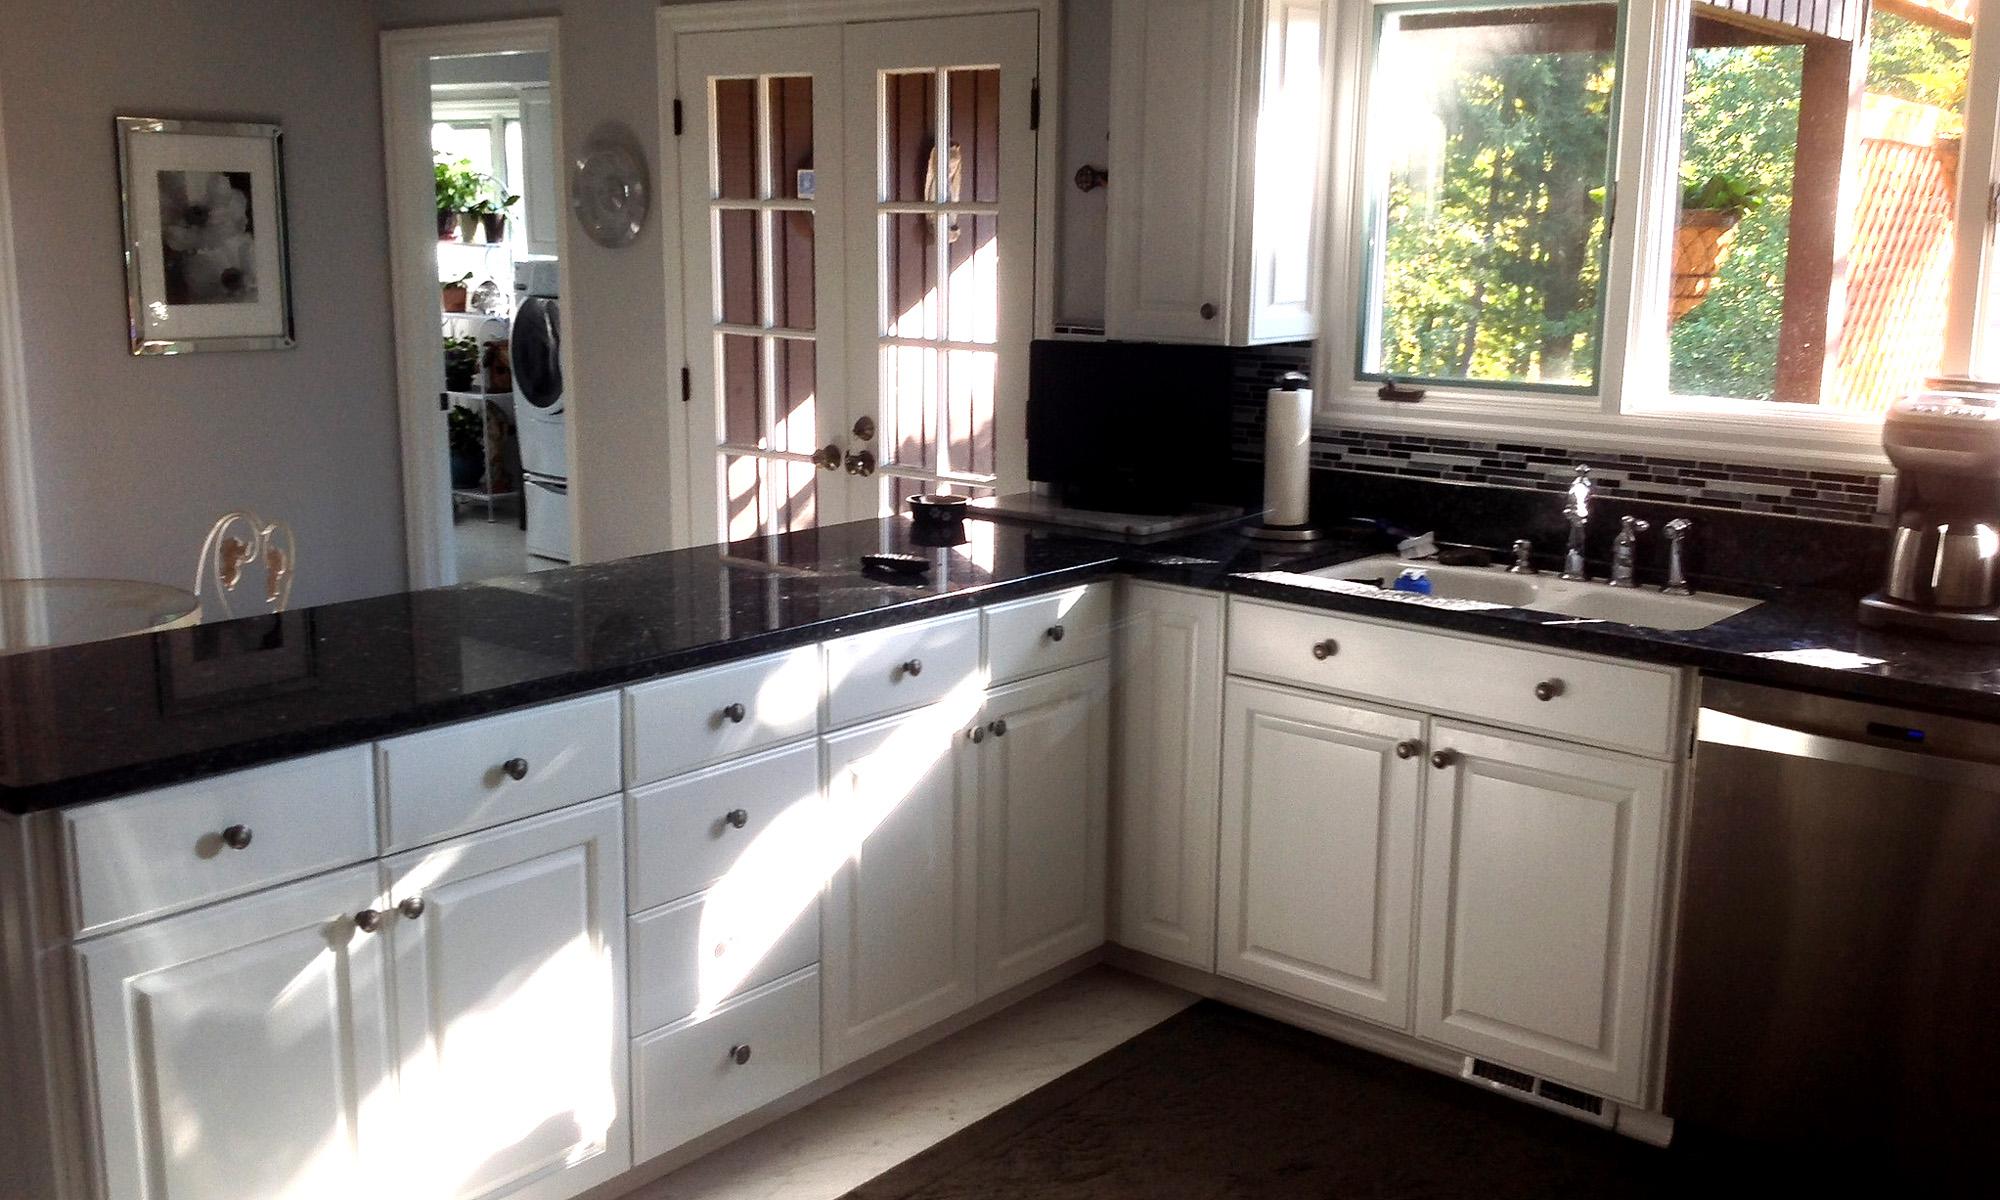 Paint-grade kitchen